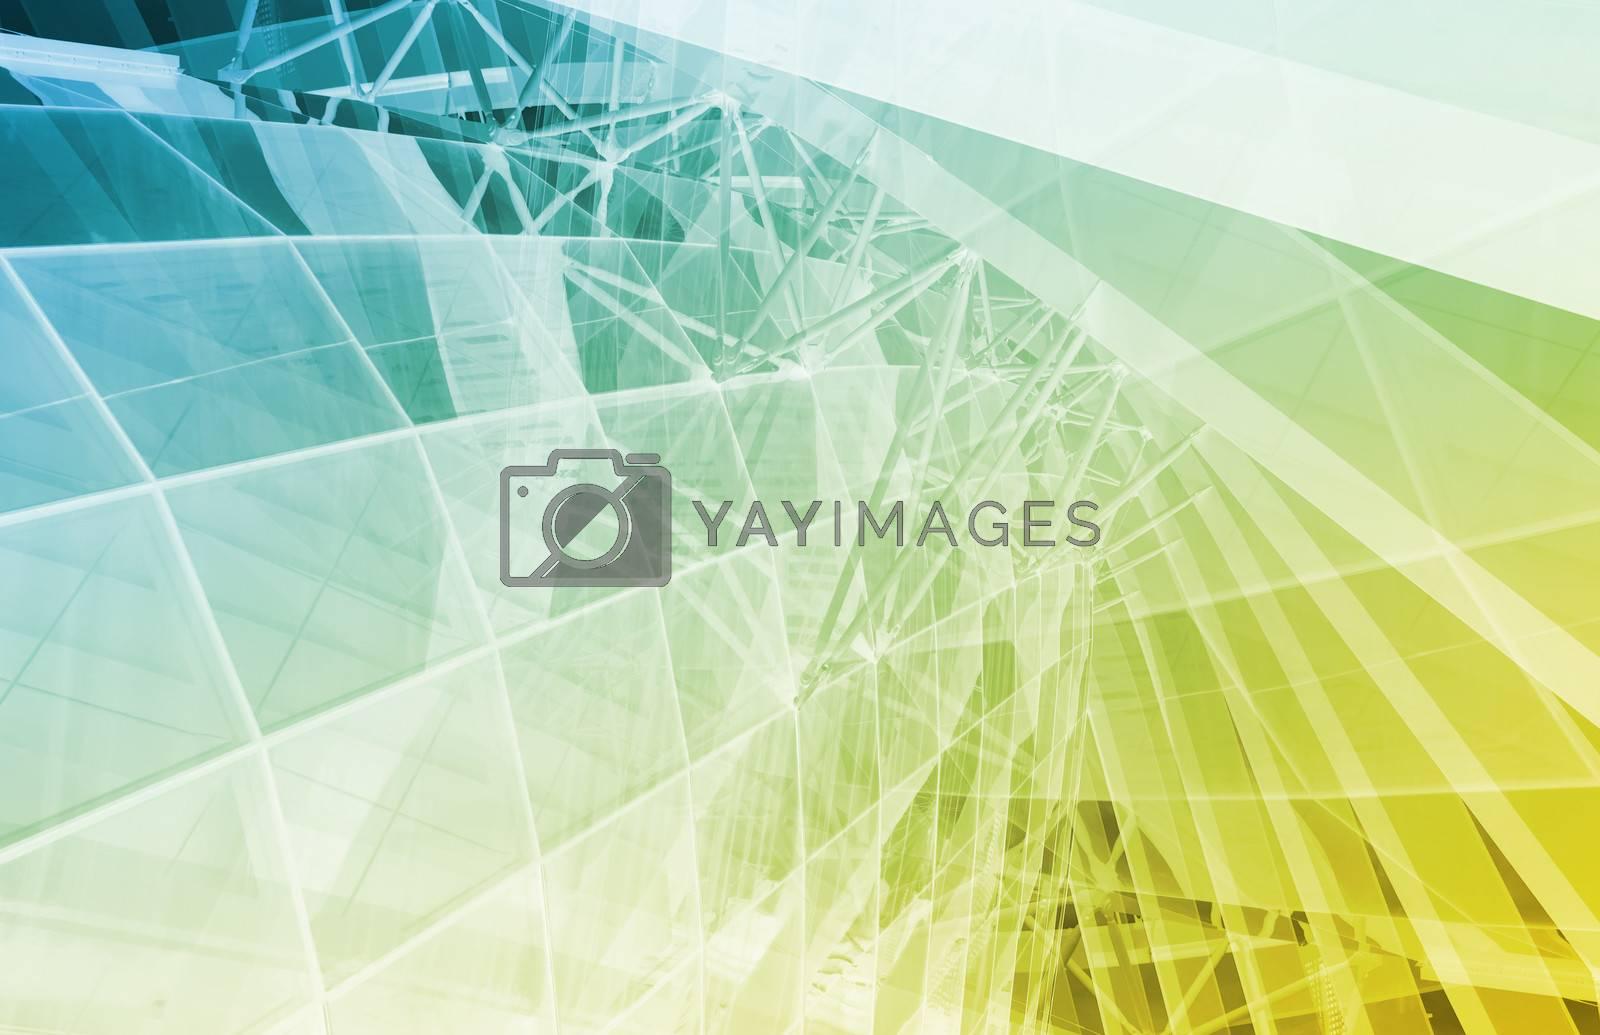 Business Communication as a Conceptual Tech Art